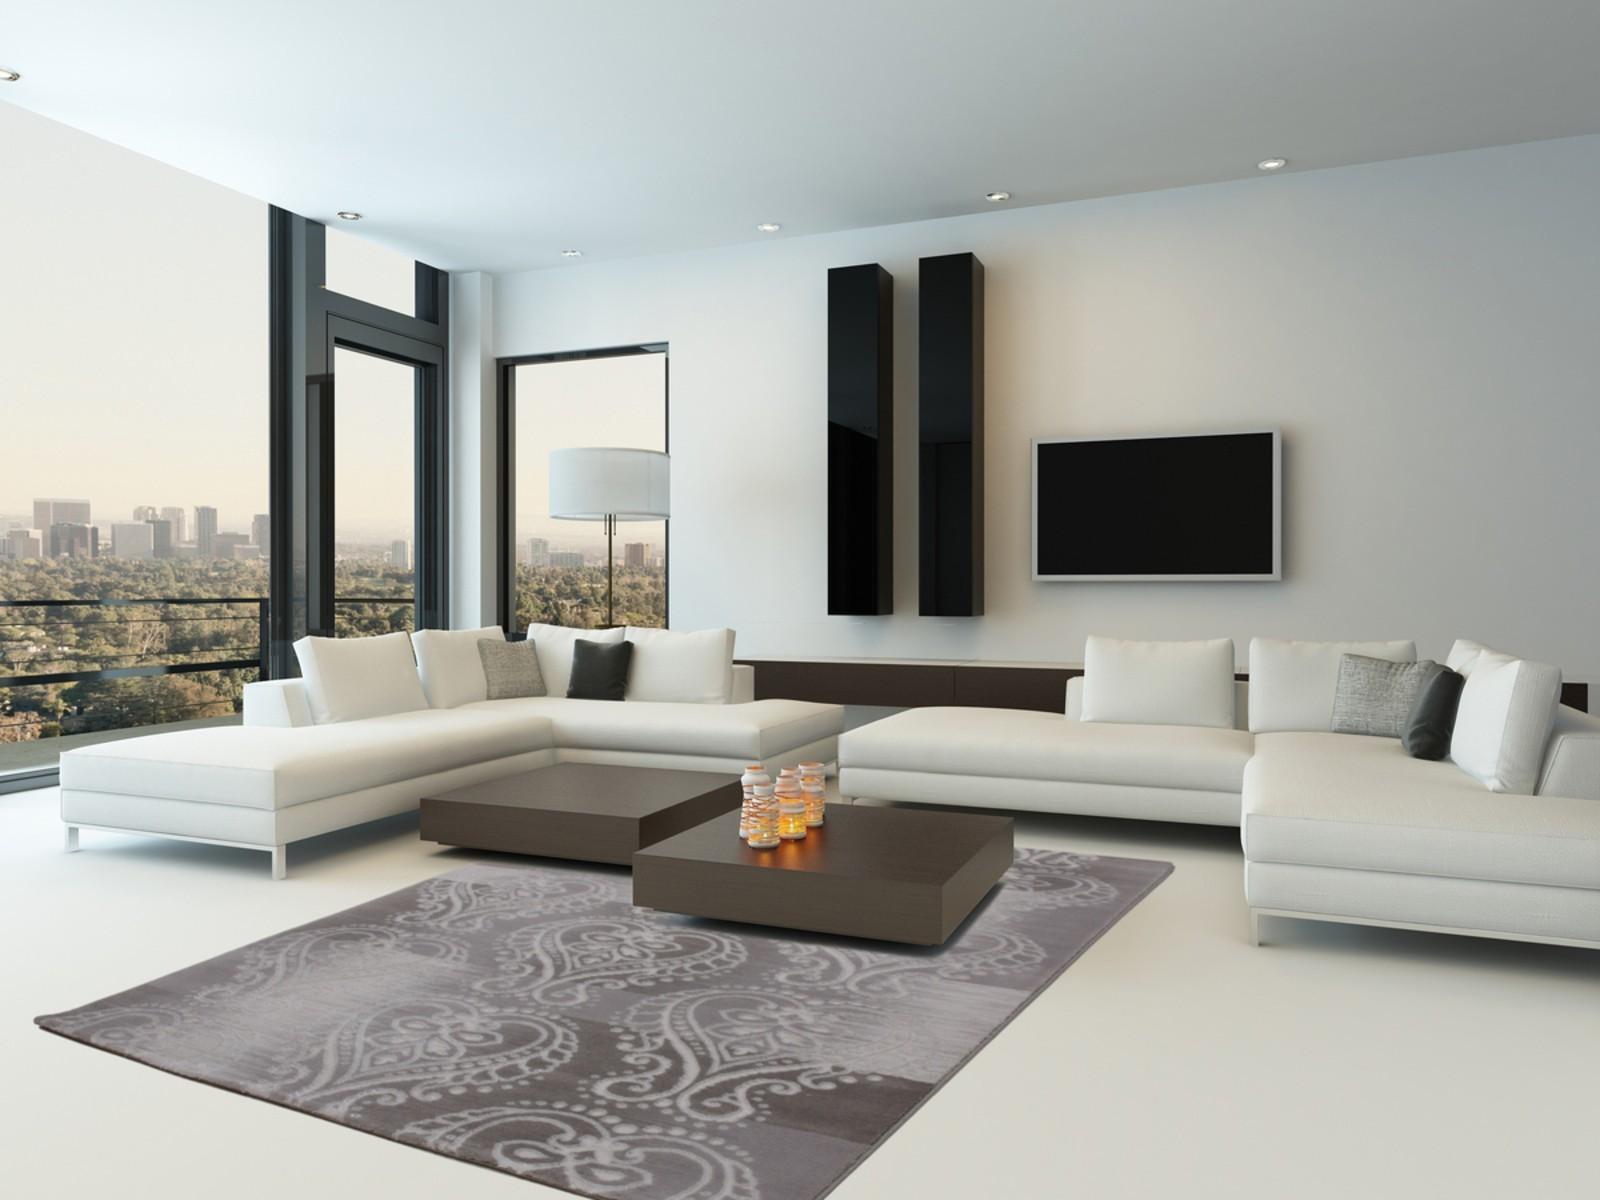 tapis salon tapis noir tapis beige tapis noir et blanc tapis vert - Tapis Salon Blanc